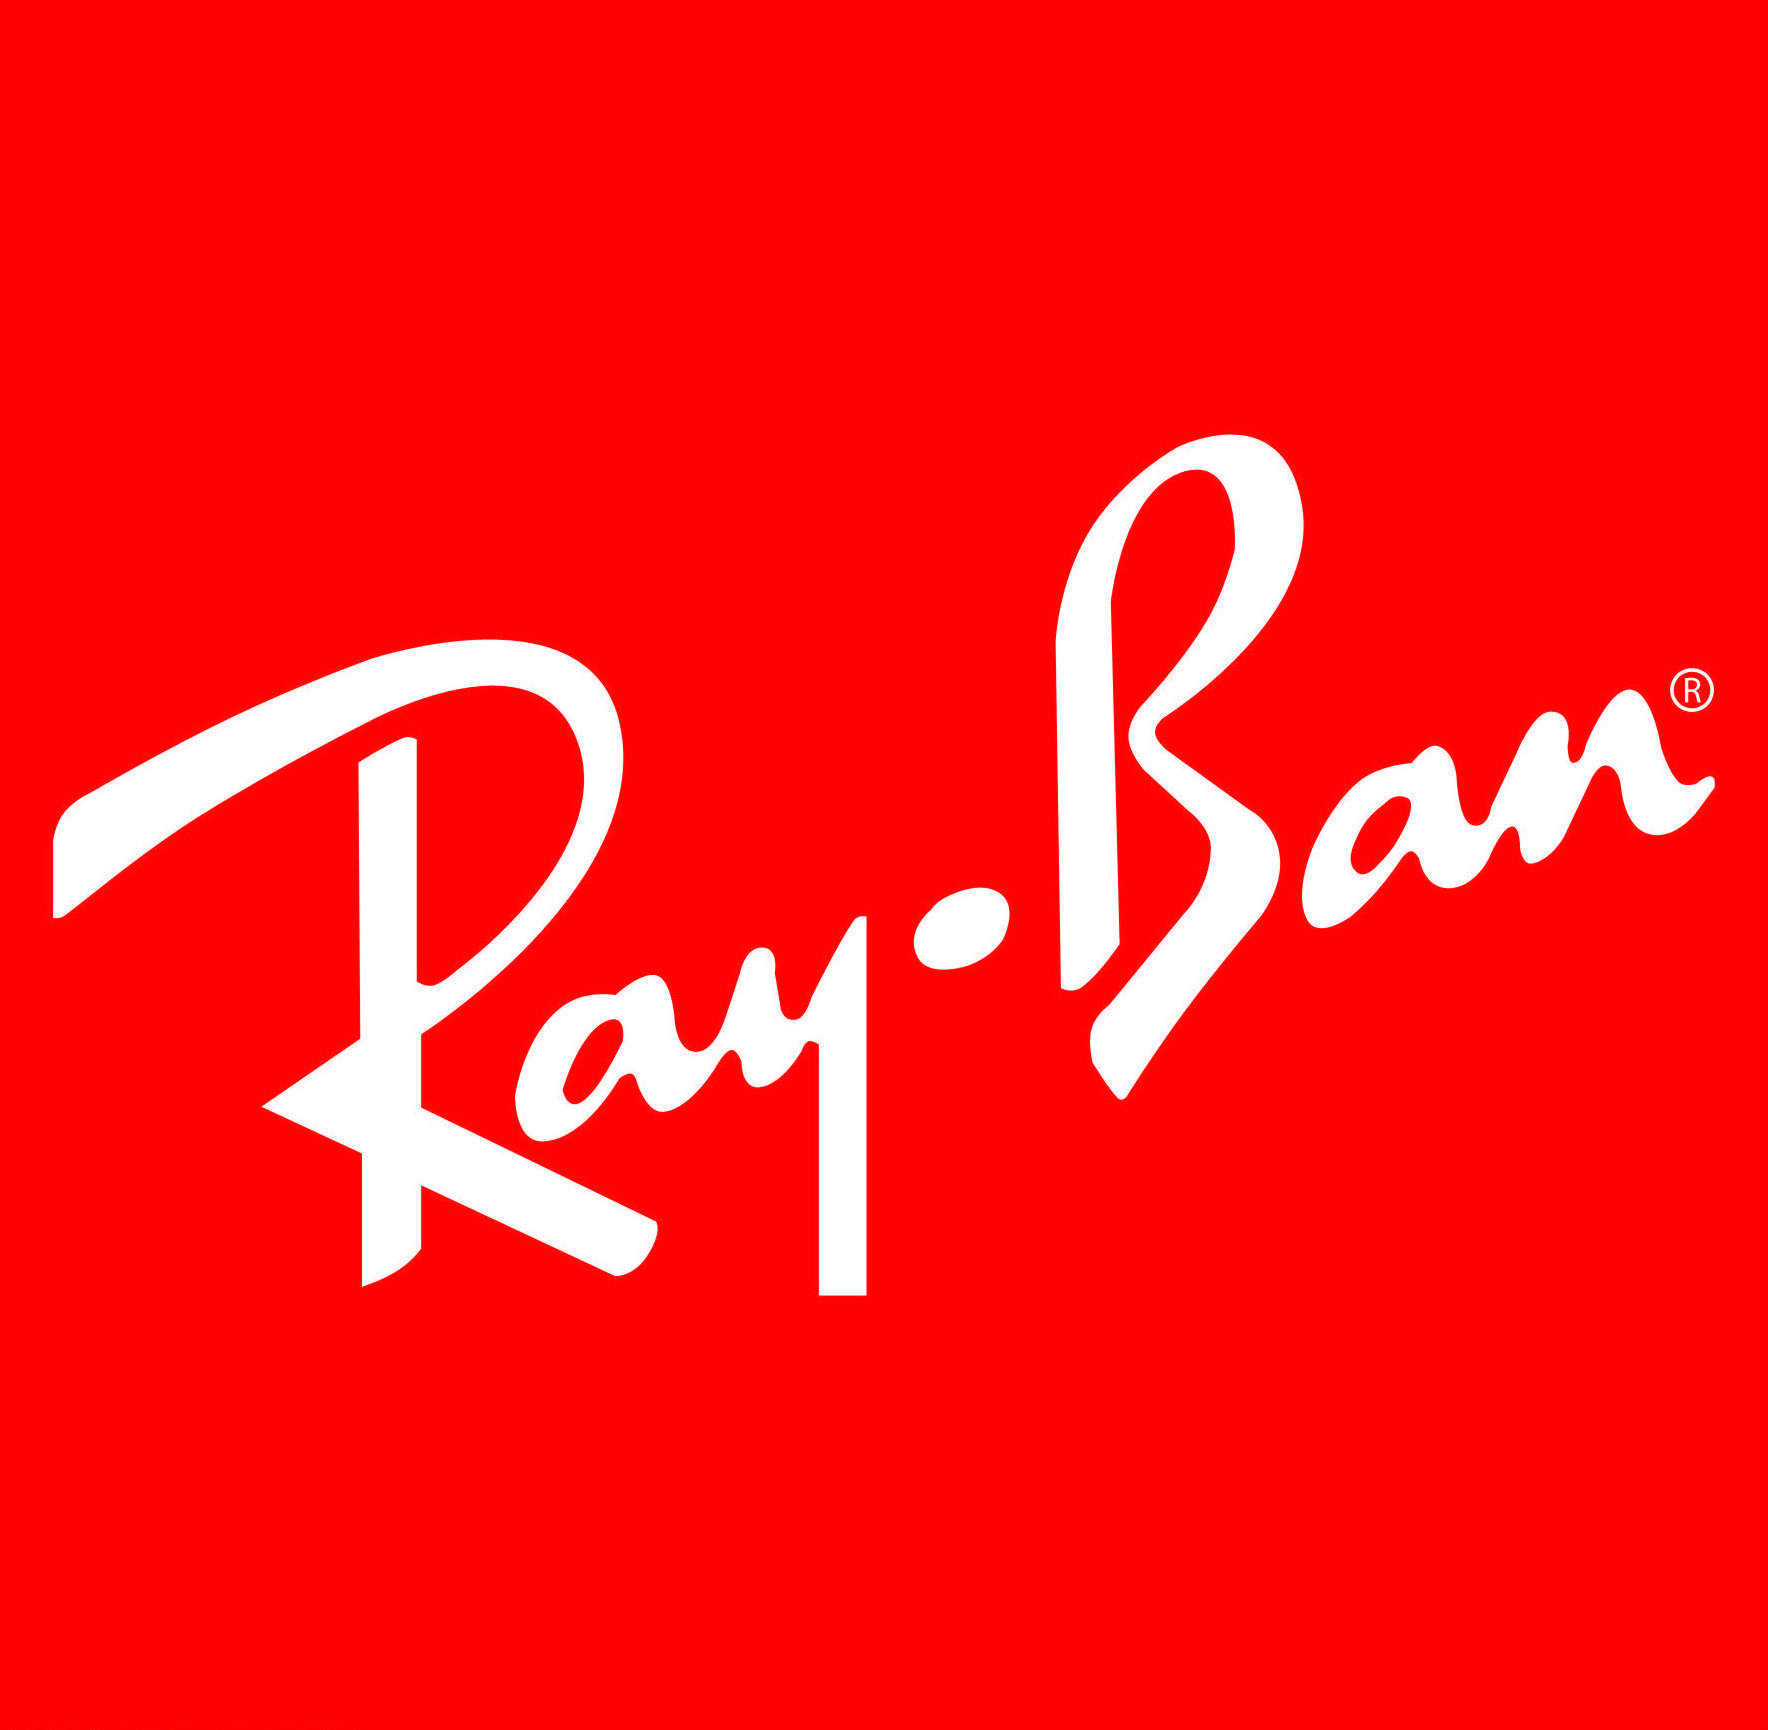 Ray-Ban雷朋眼镜 & 太阳镜